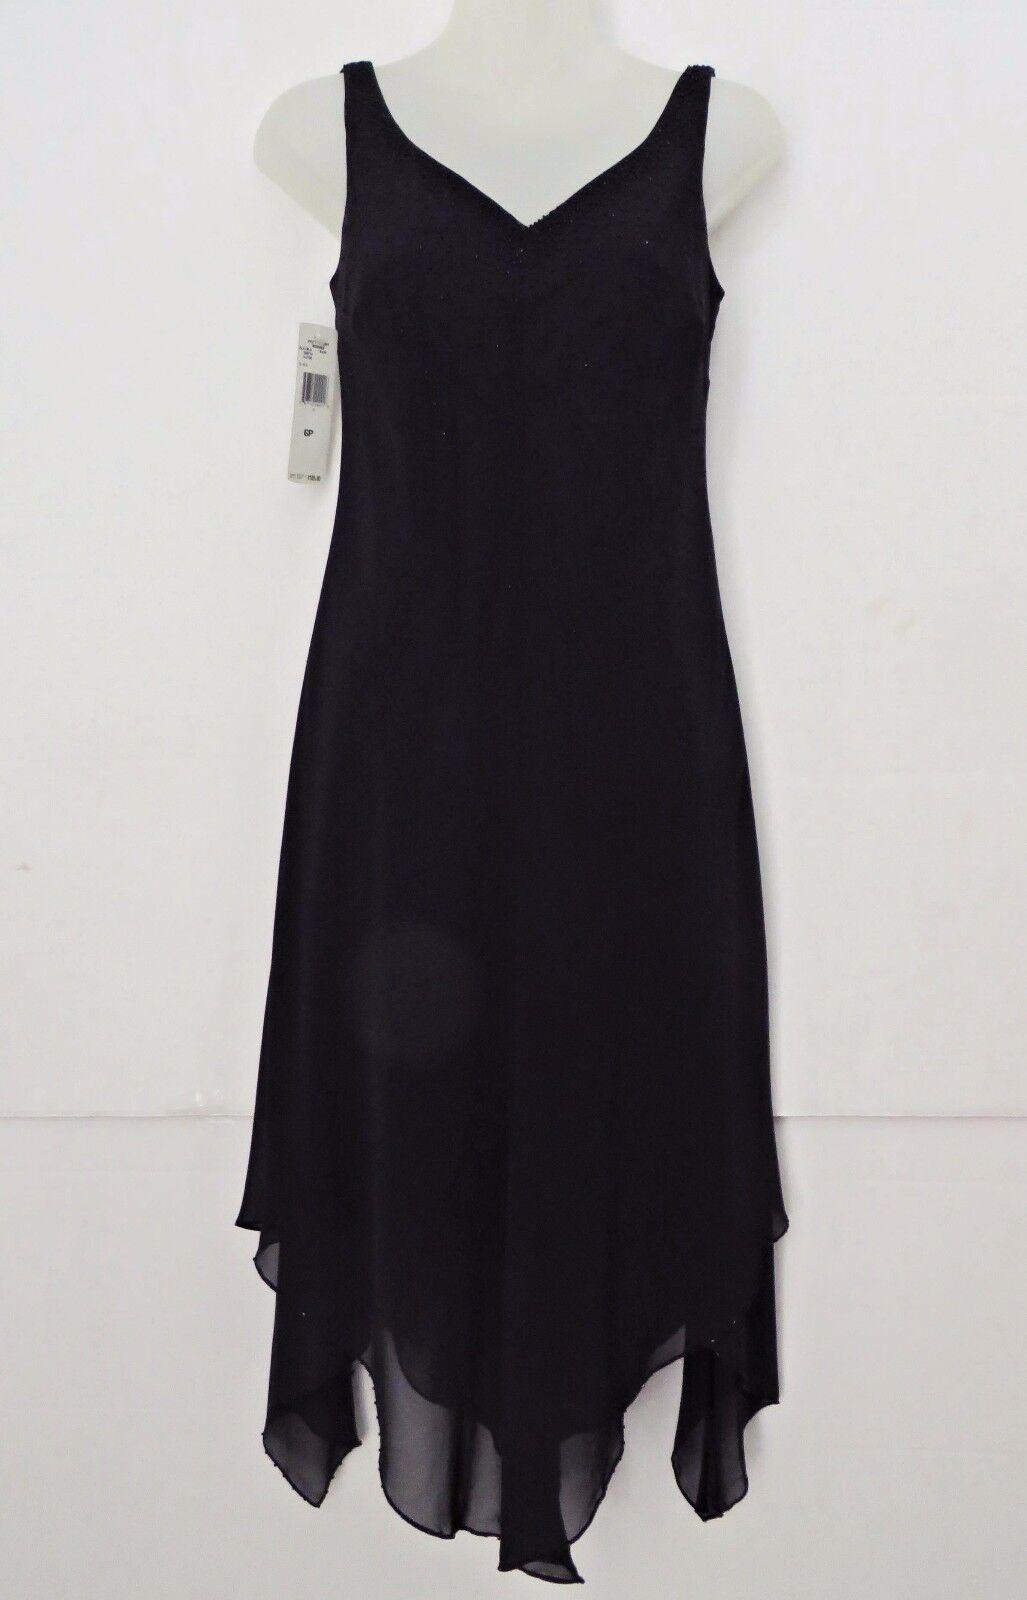 NWT  EVAN PICONE schwarz Flapper Beaded Long Maxi Dress Dressy Party Sz 6P